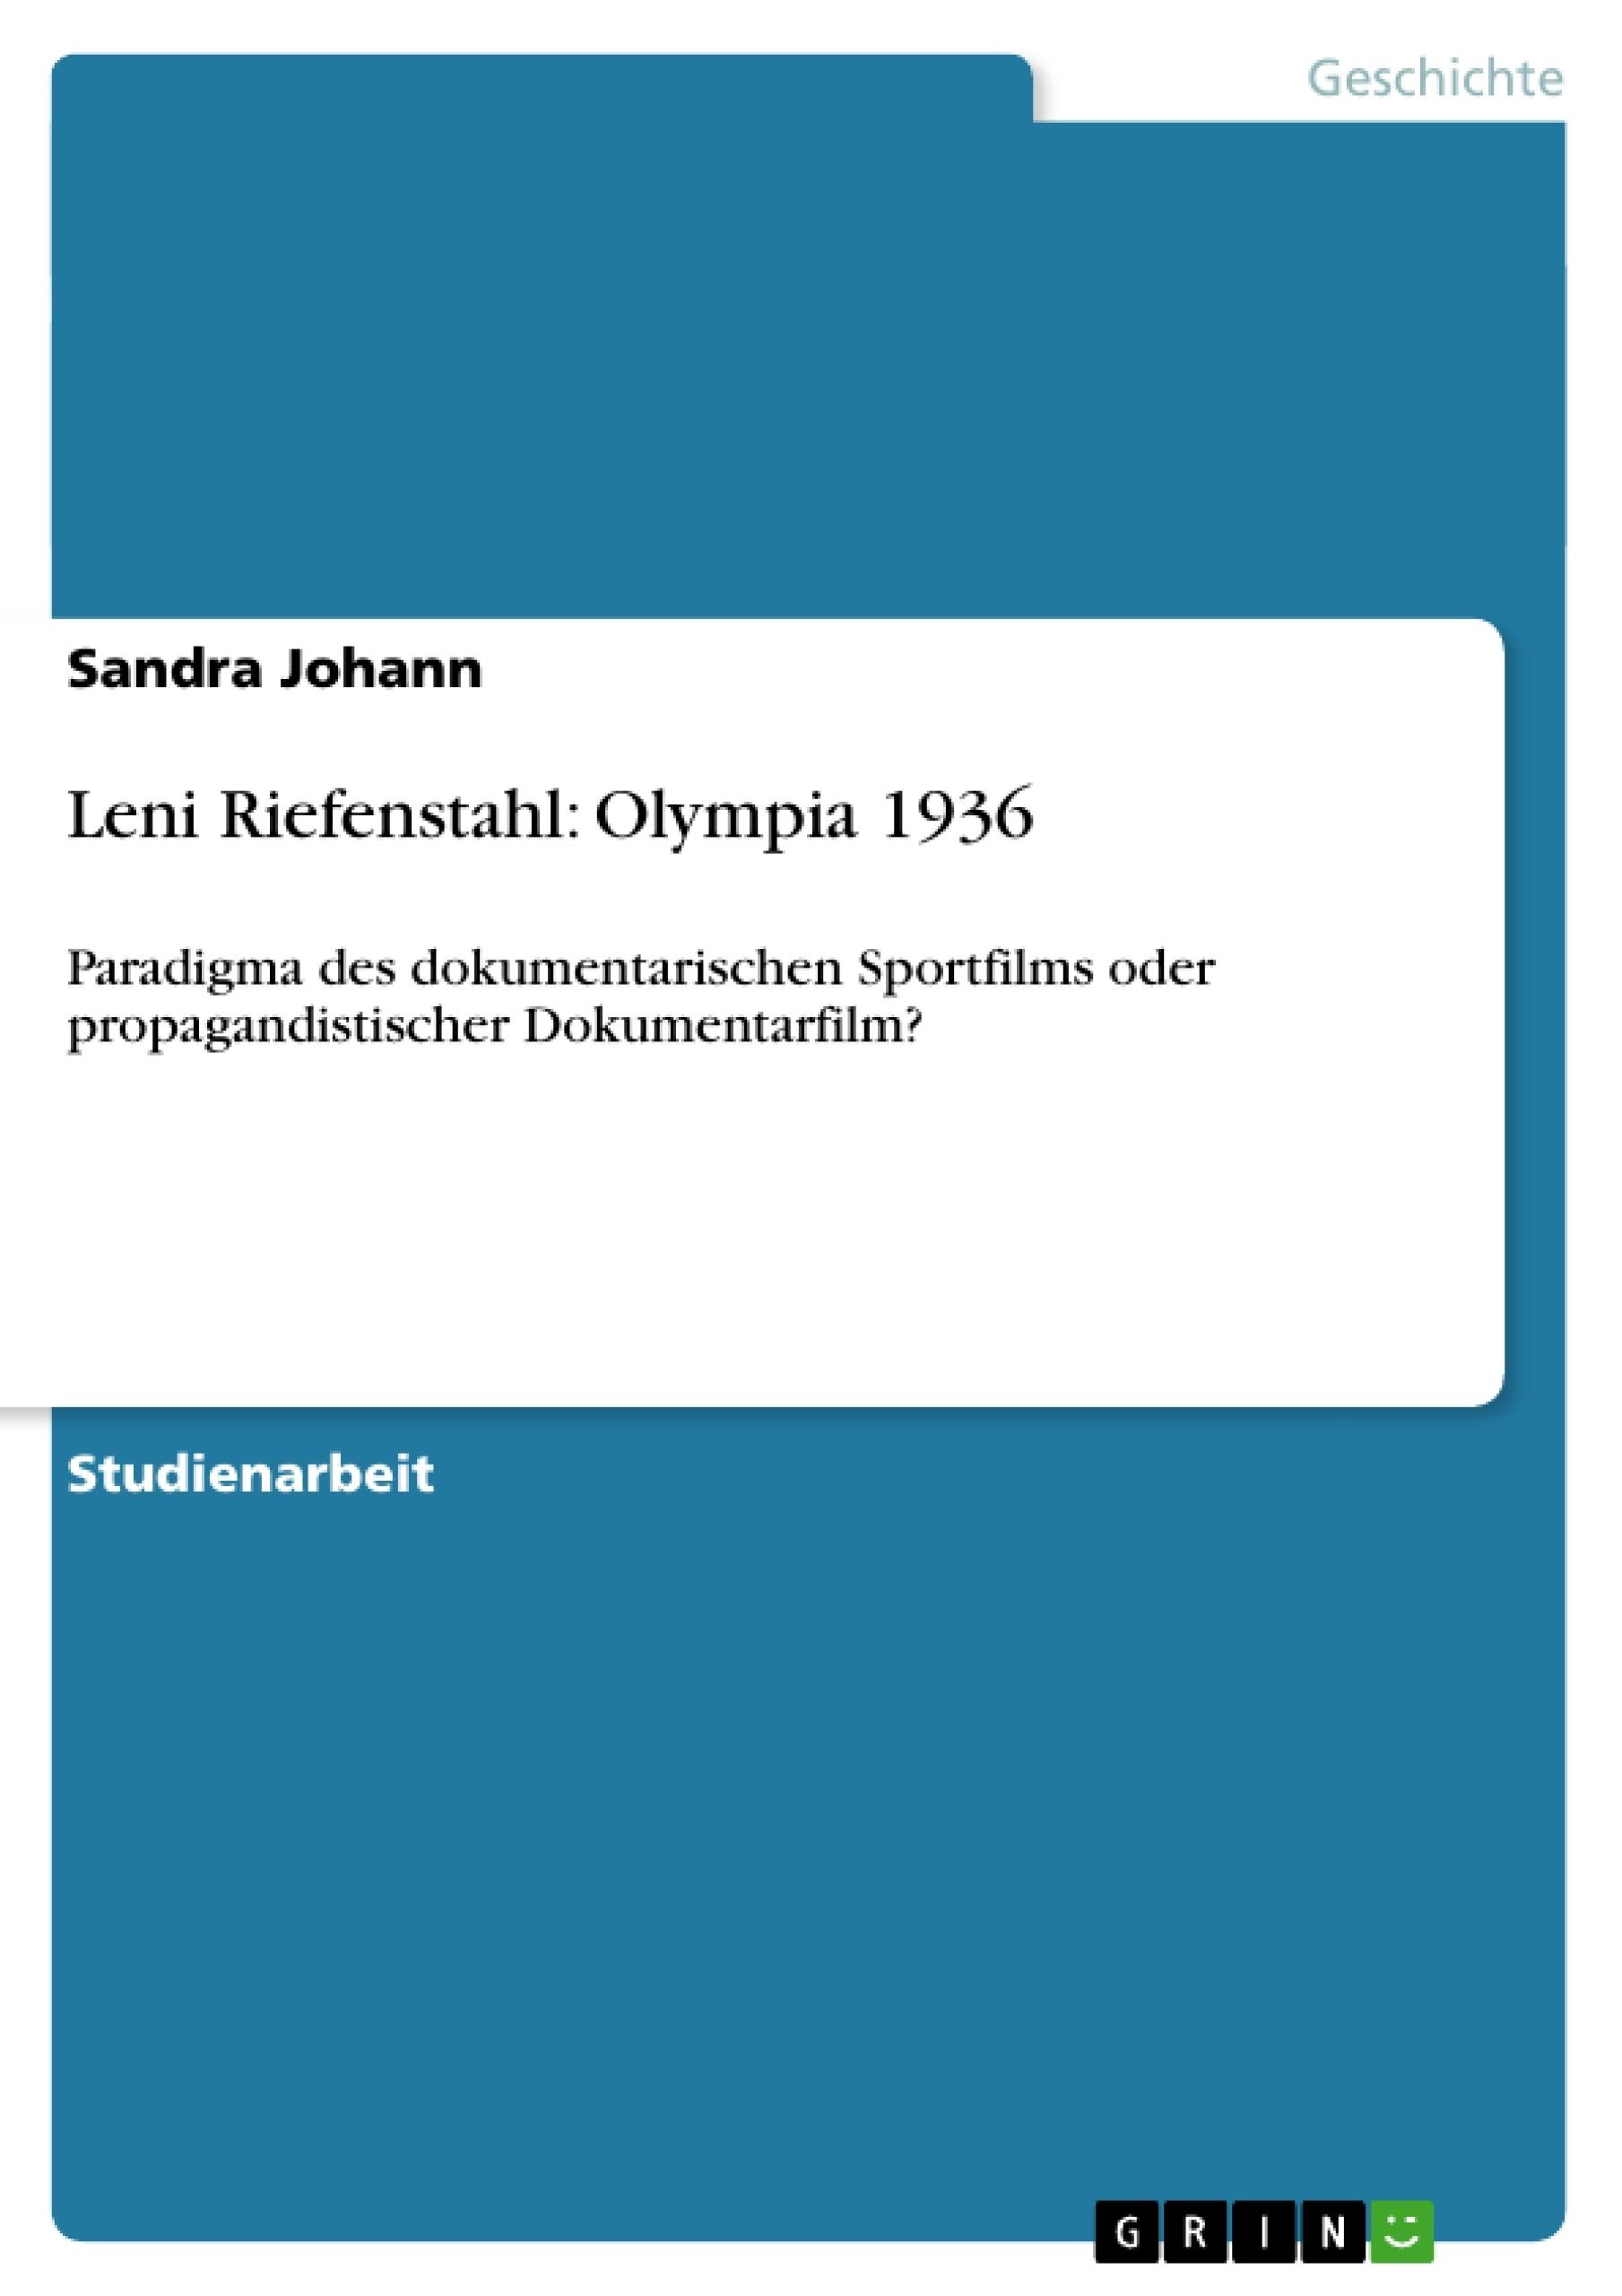 Titel: Leni Riefenstahl: Olympia 1936